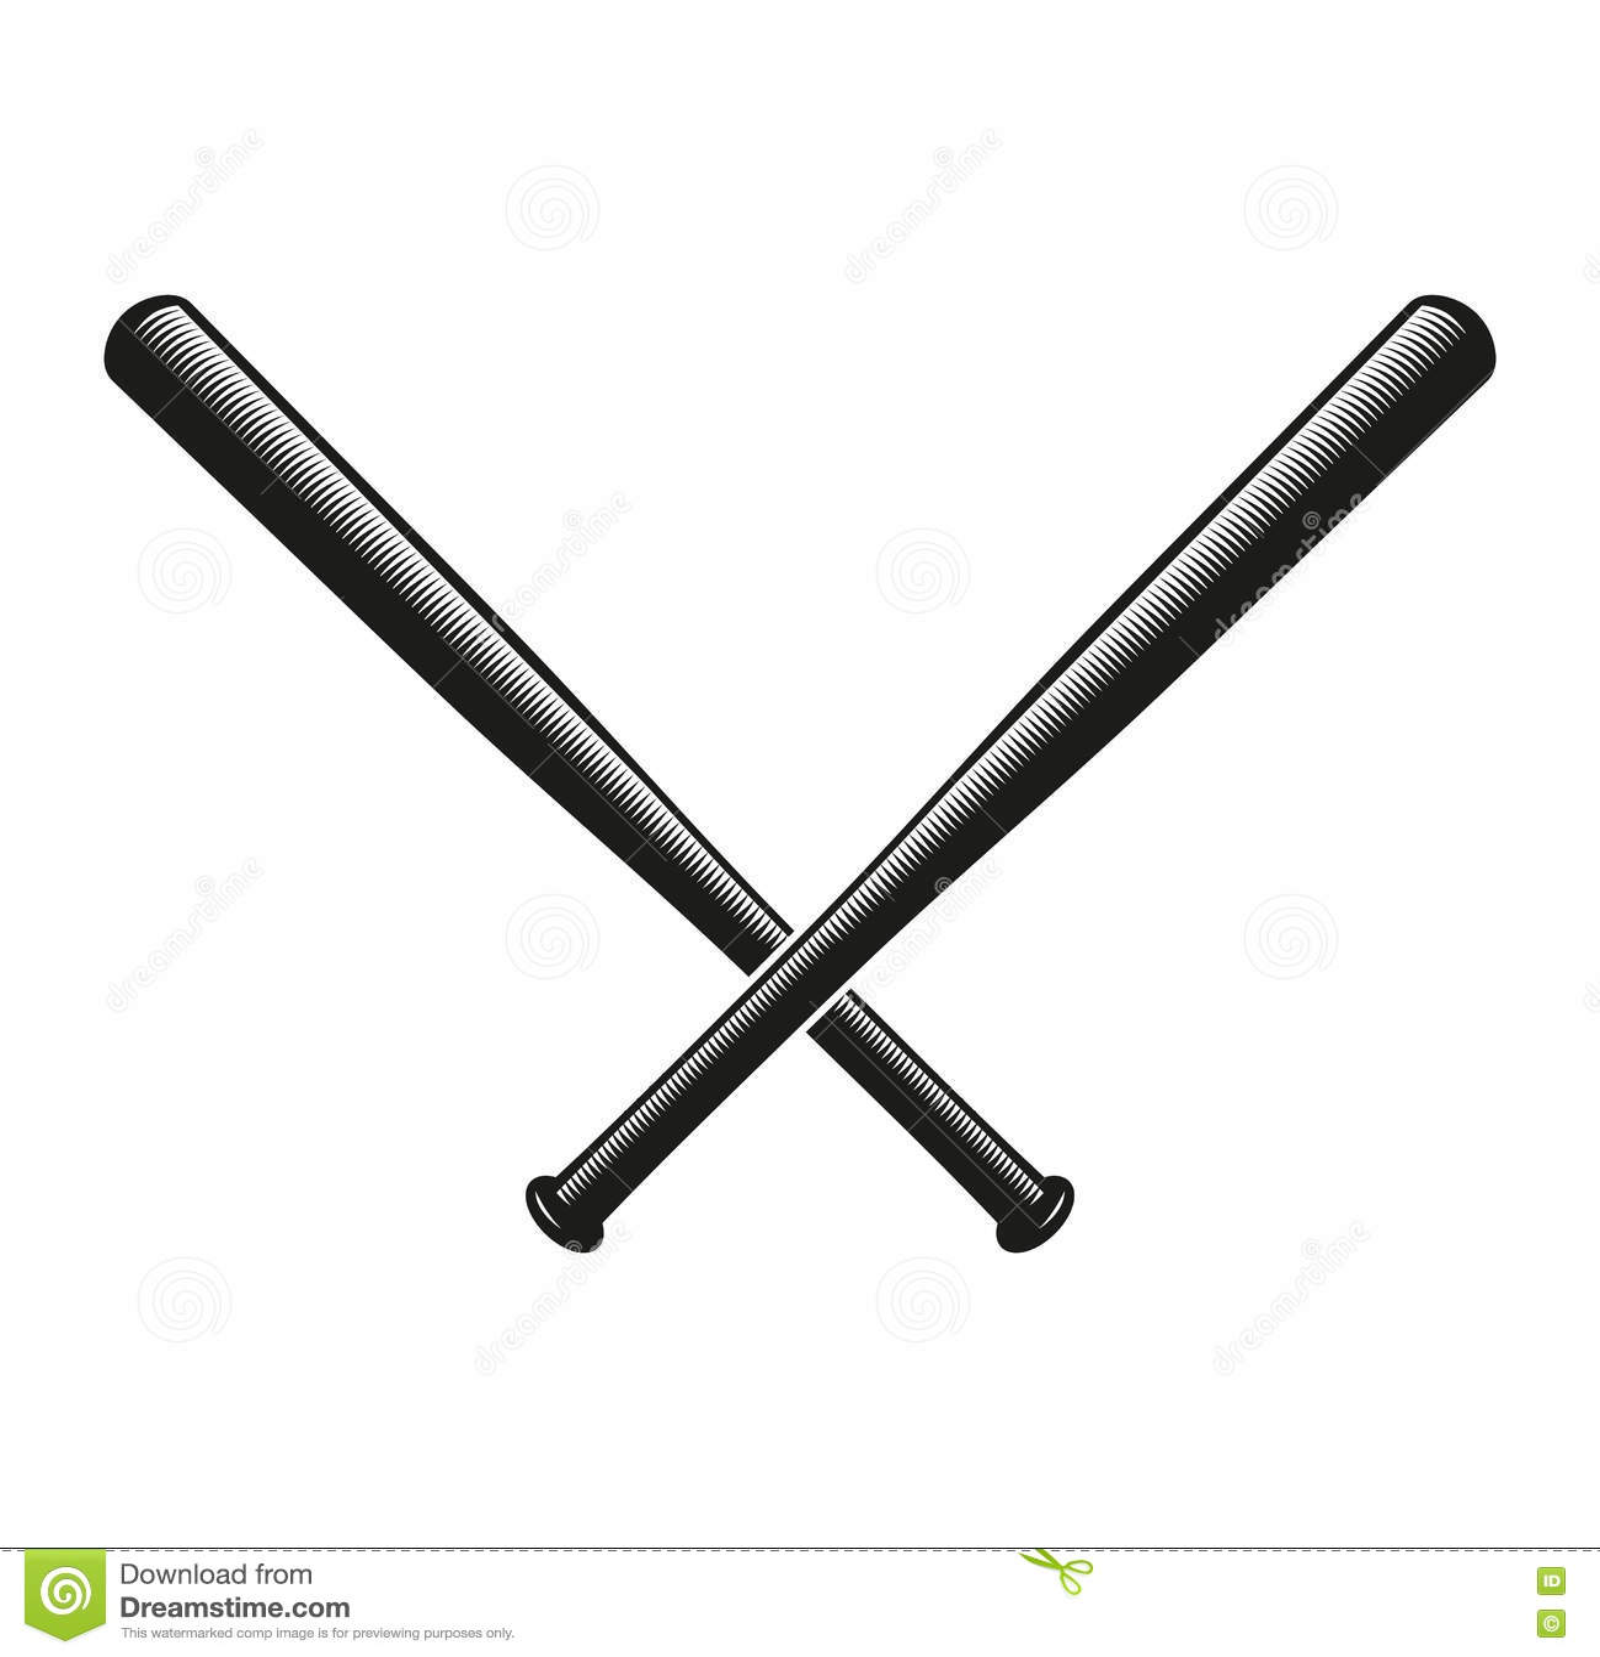 Het geïsoleerde abstracte zwarte kleur gekruiste embleem van honkbalknuppels Amerikaans sportmateriaal logotype Nationaal spelpic